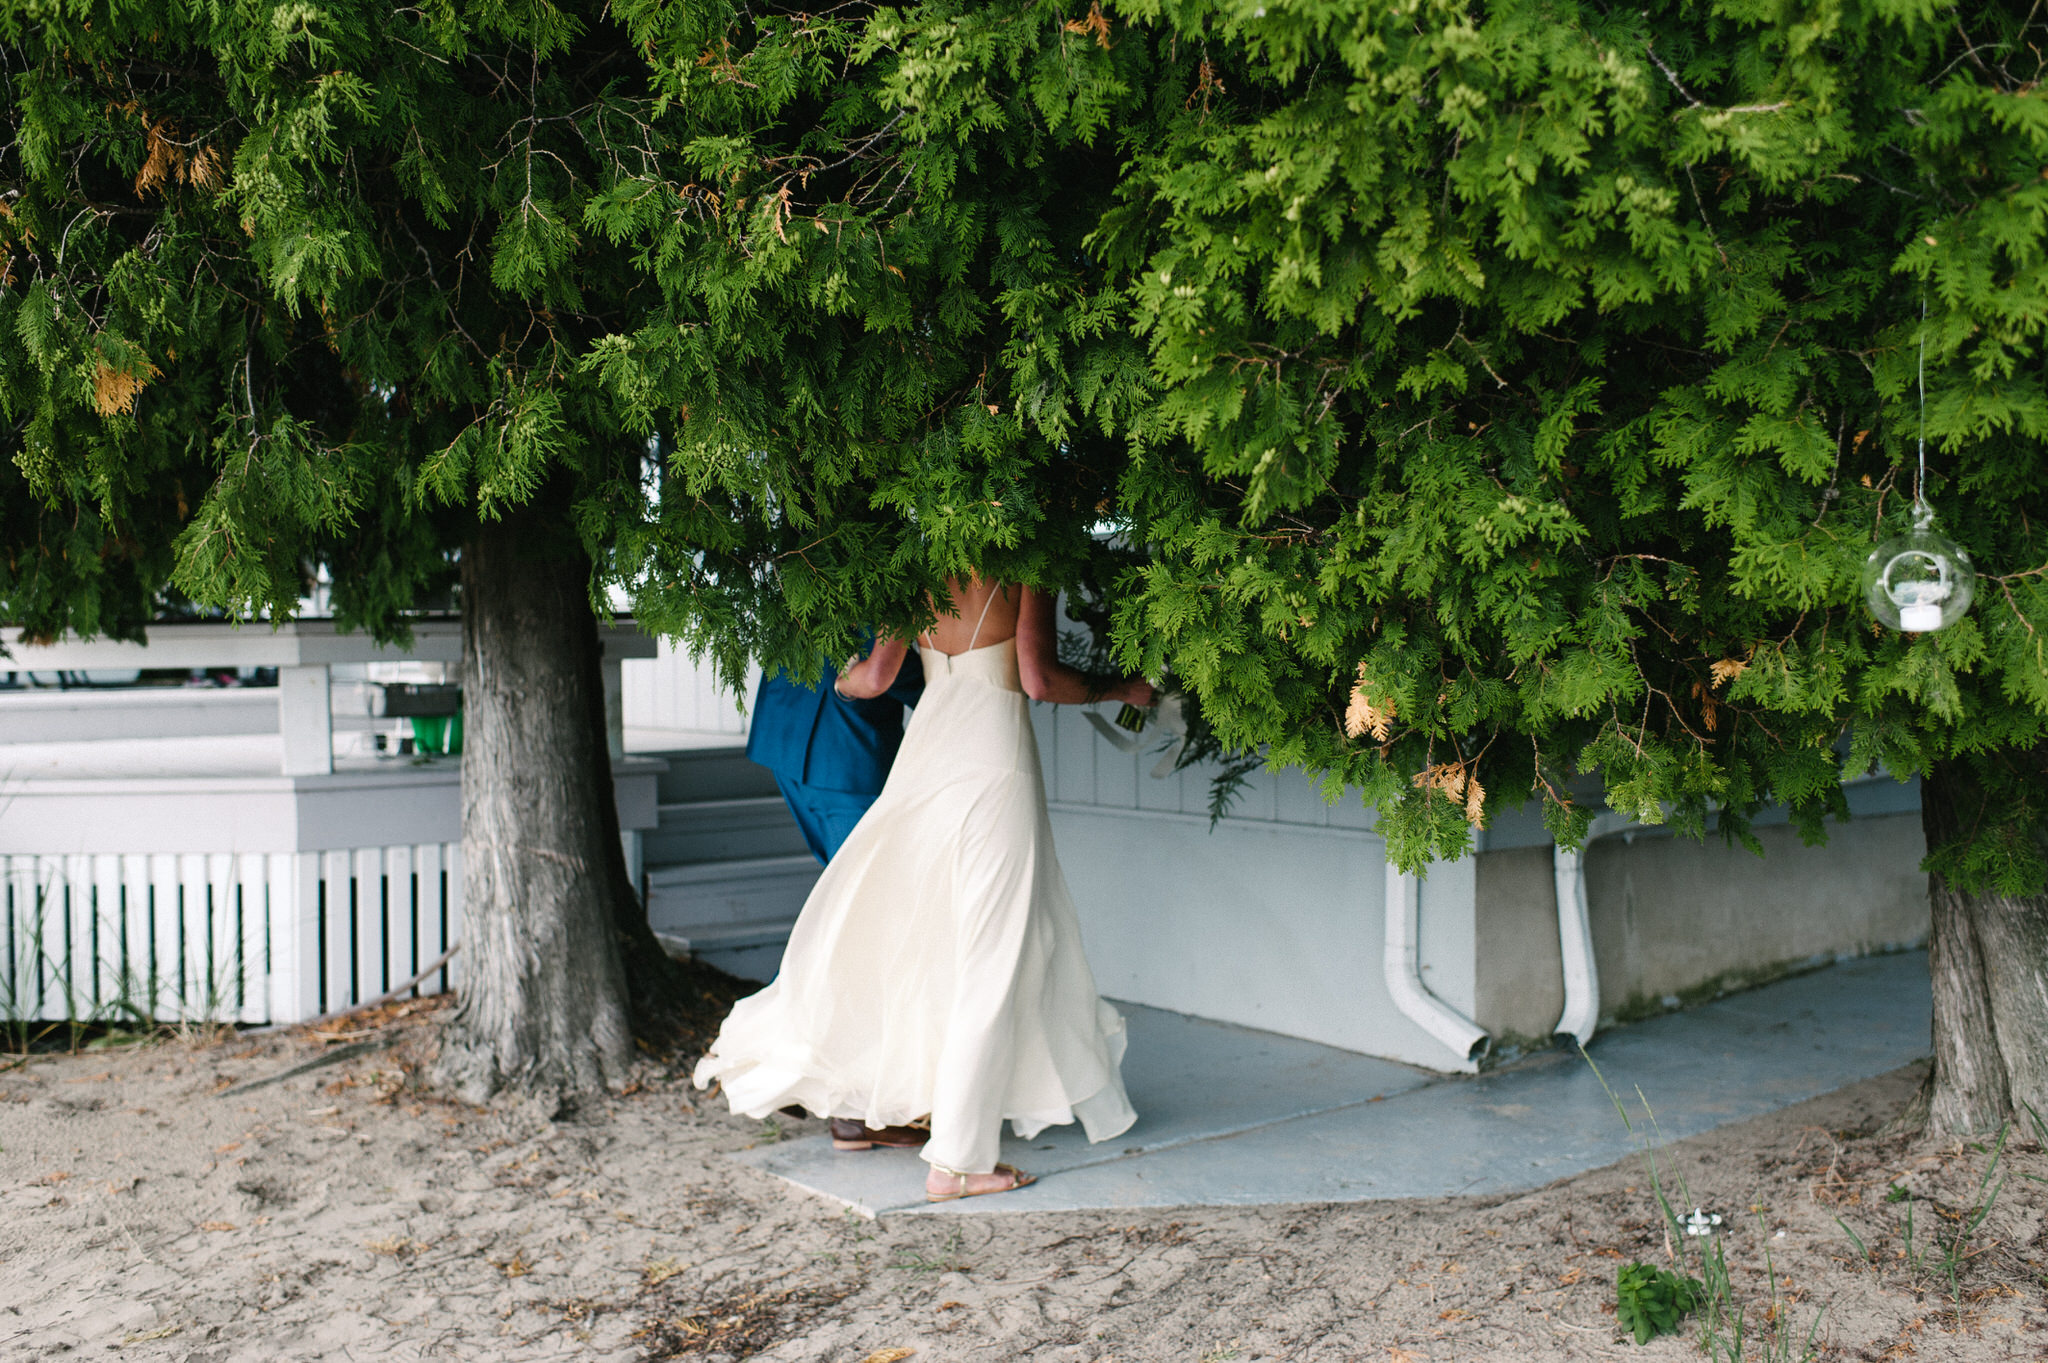 toronto wedding photography scarlet oneill098.JPG